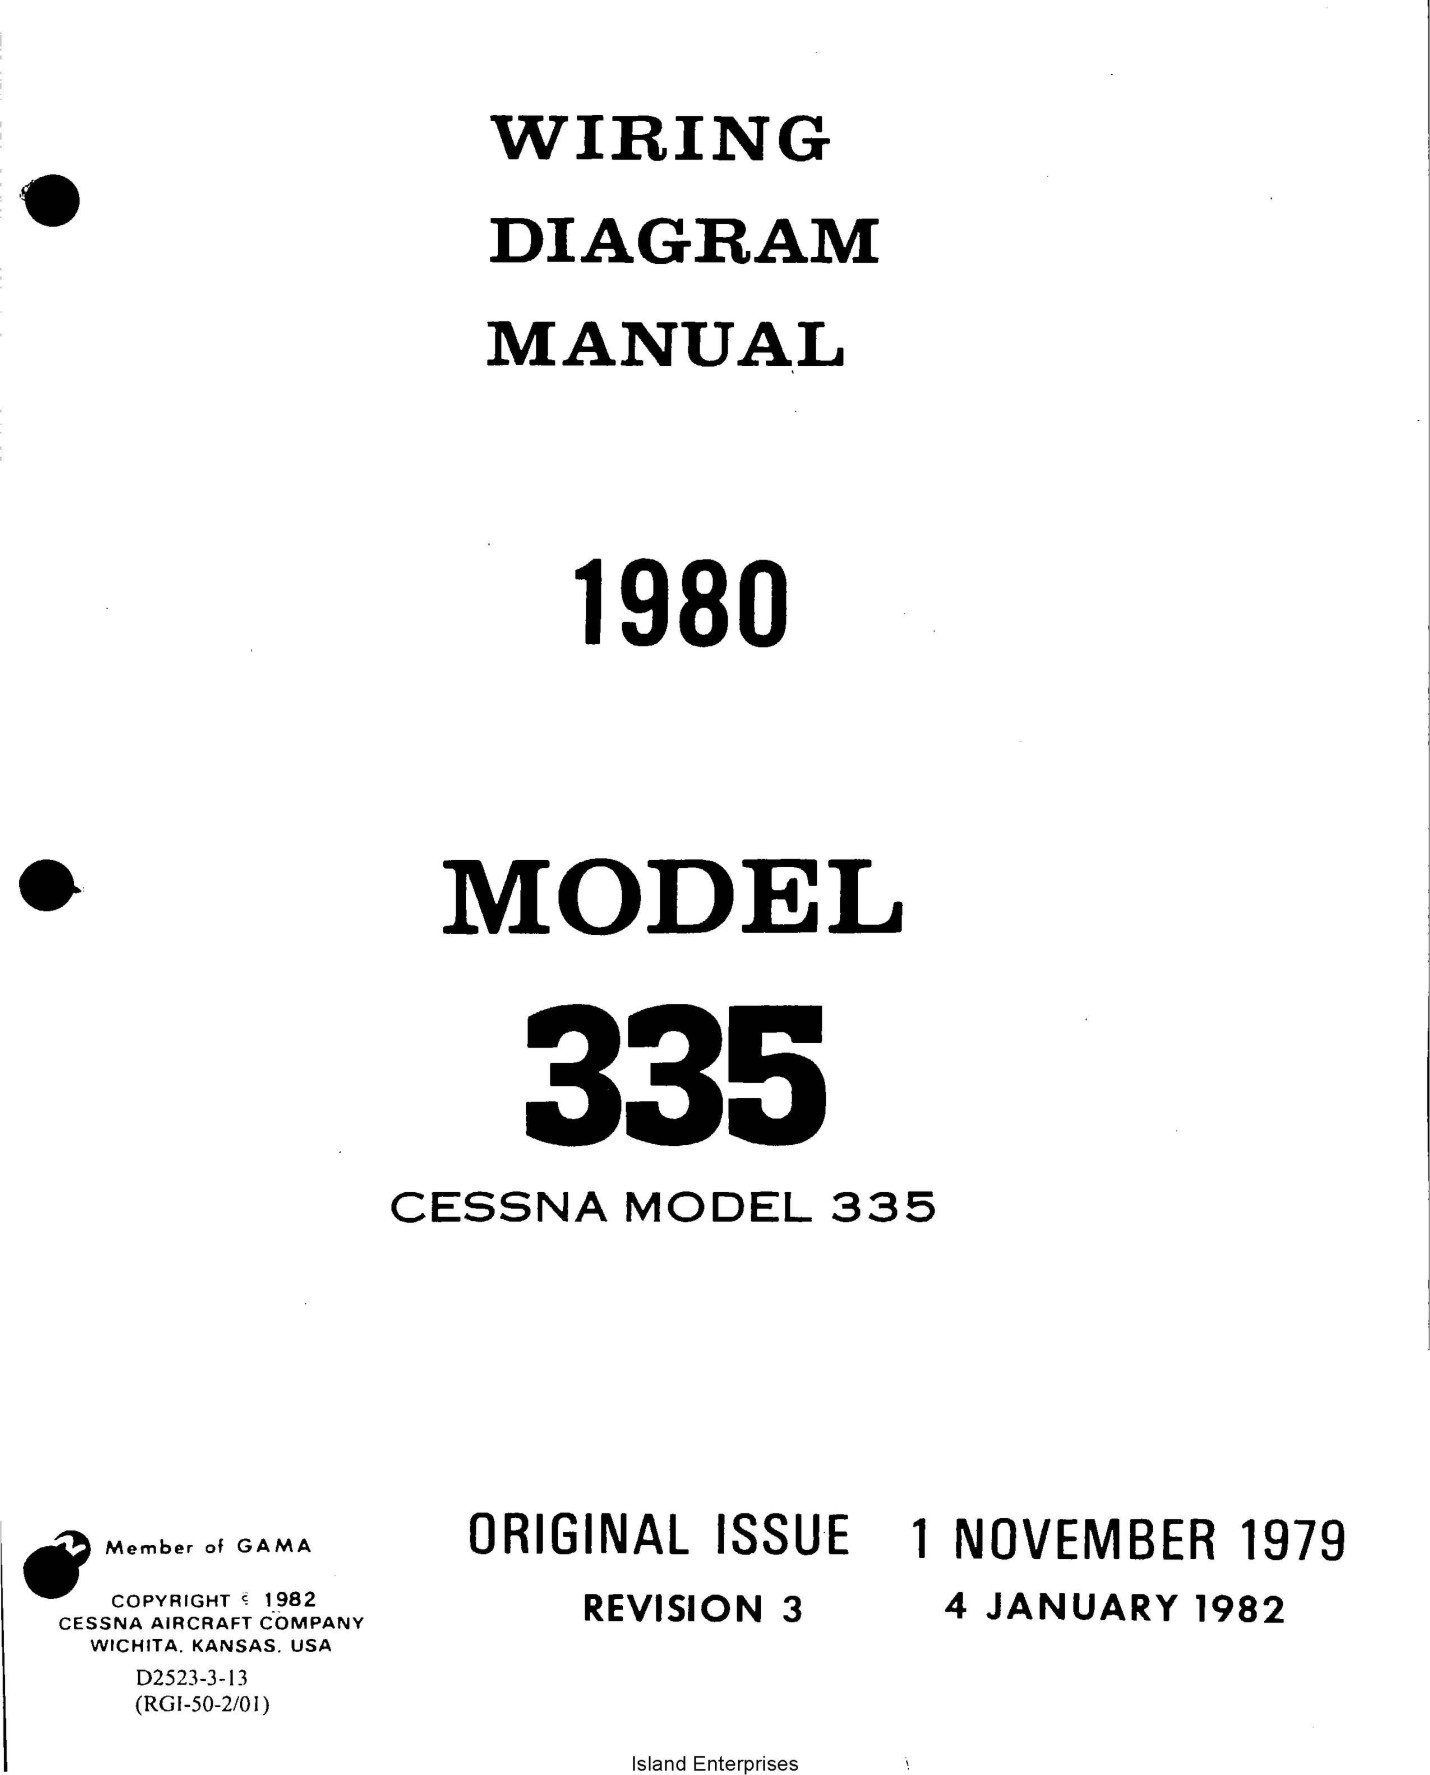 Gibson 335 Wiring Diagram Download Manual Guide